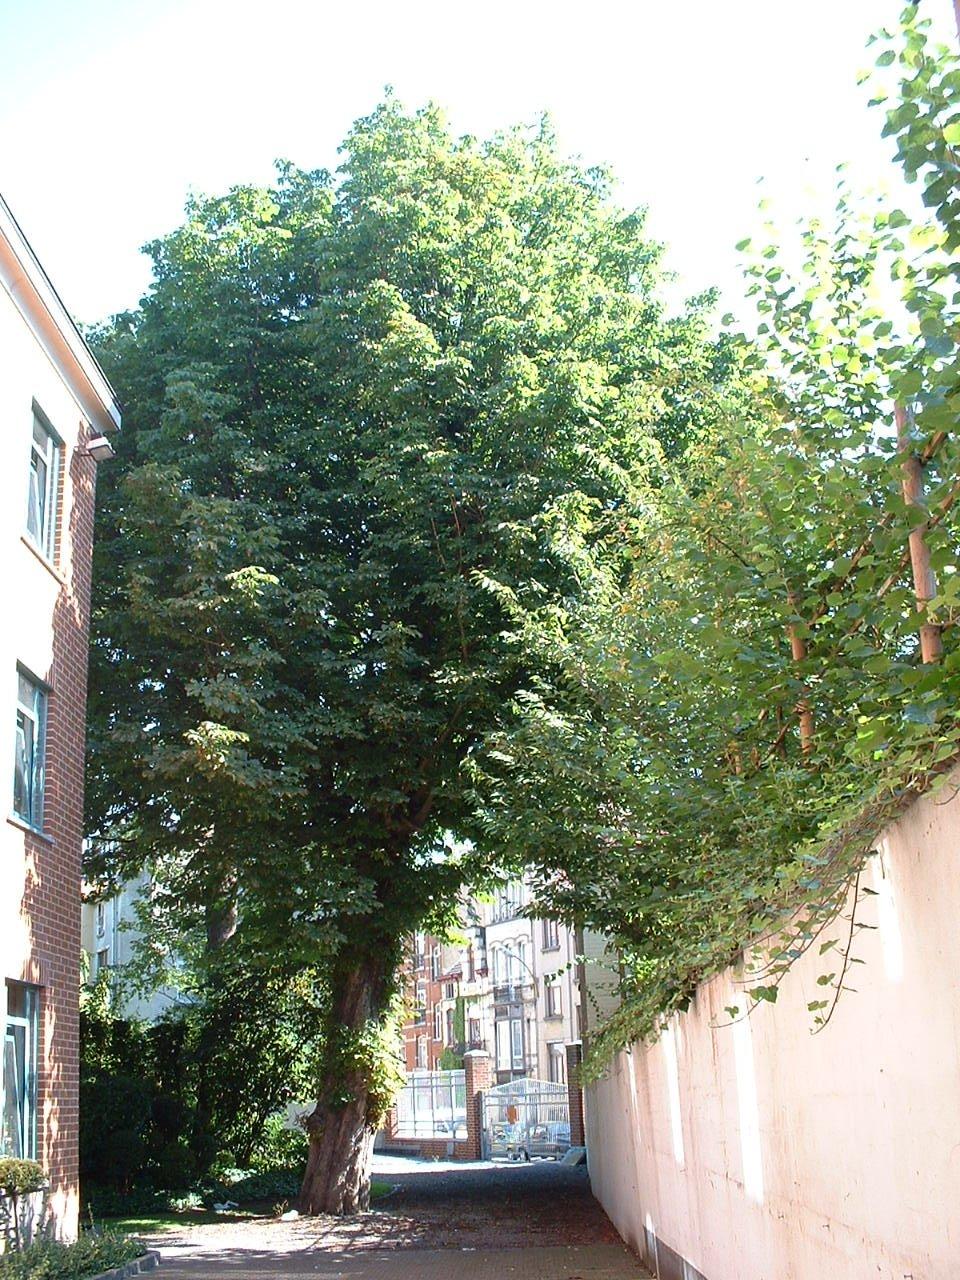 Marronnier commun – Schaerbeek, Rue Thomas Vinçotte, 36 –  16 Juillet 2002